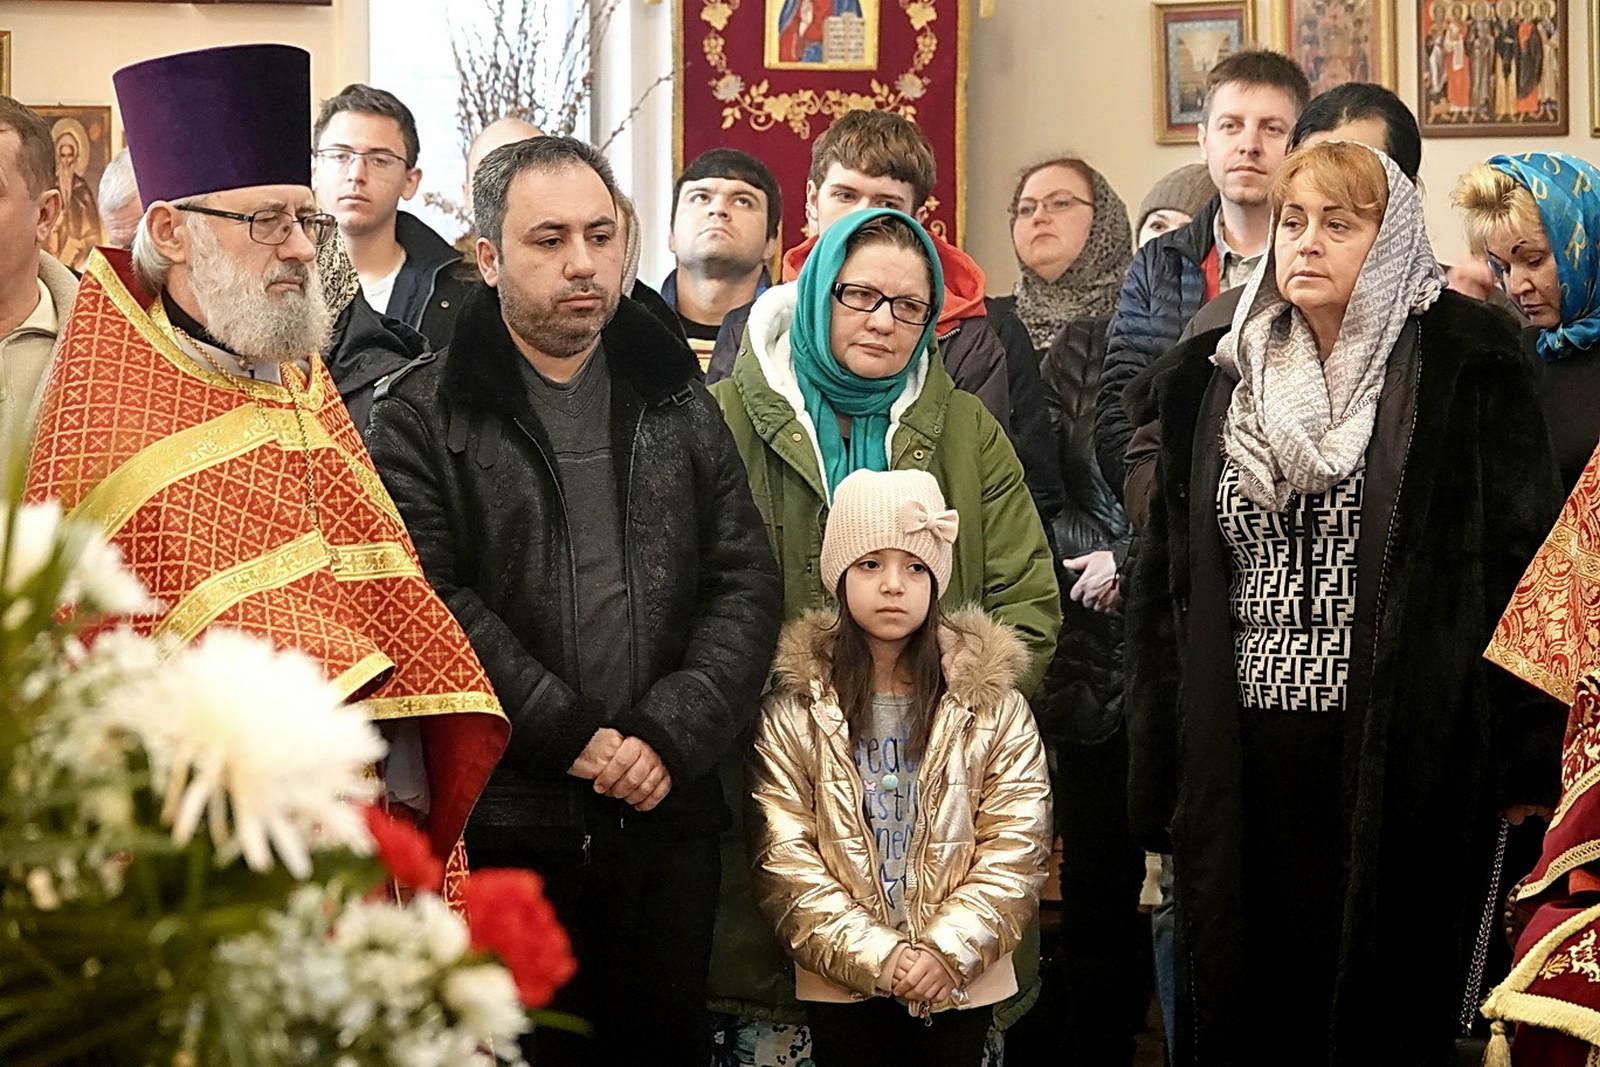 Prestol-prazdnik_10-Feb-2019_30